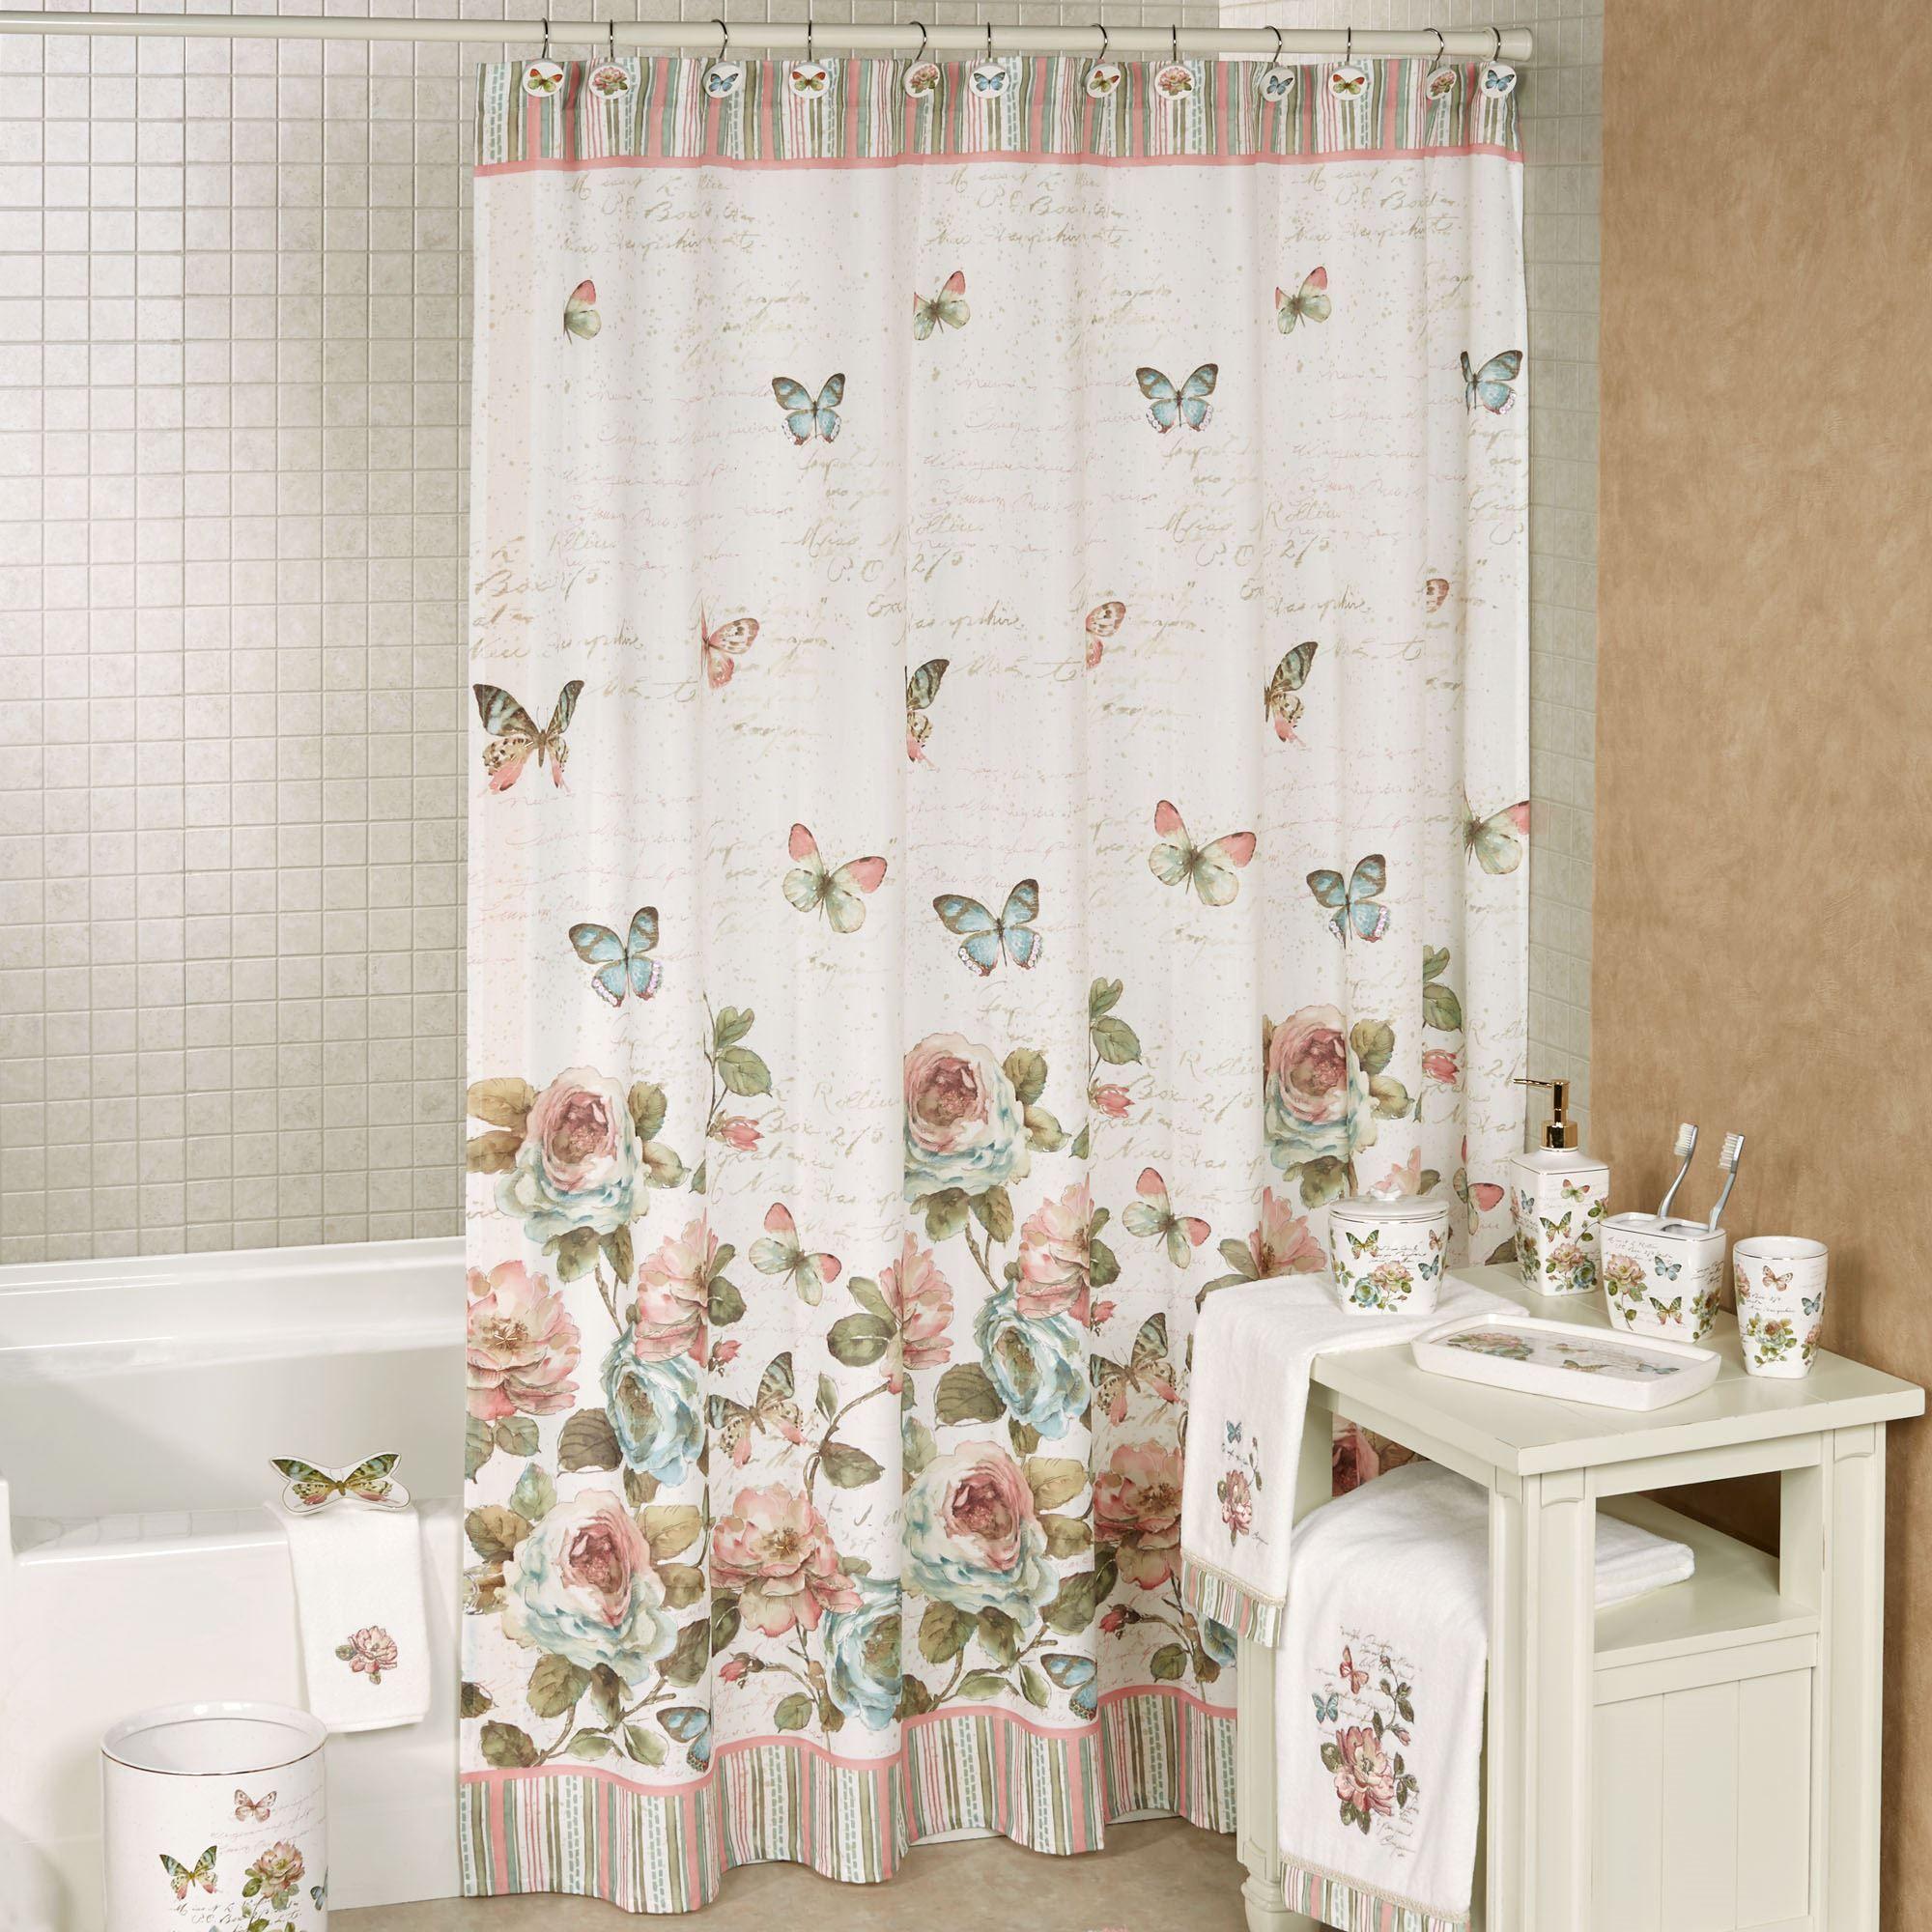 Butterfly Garden Shower Curtain Ivory 72 X